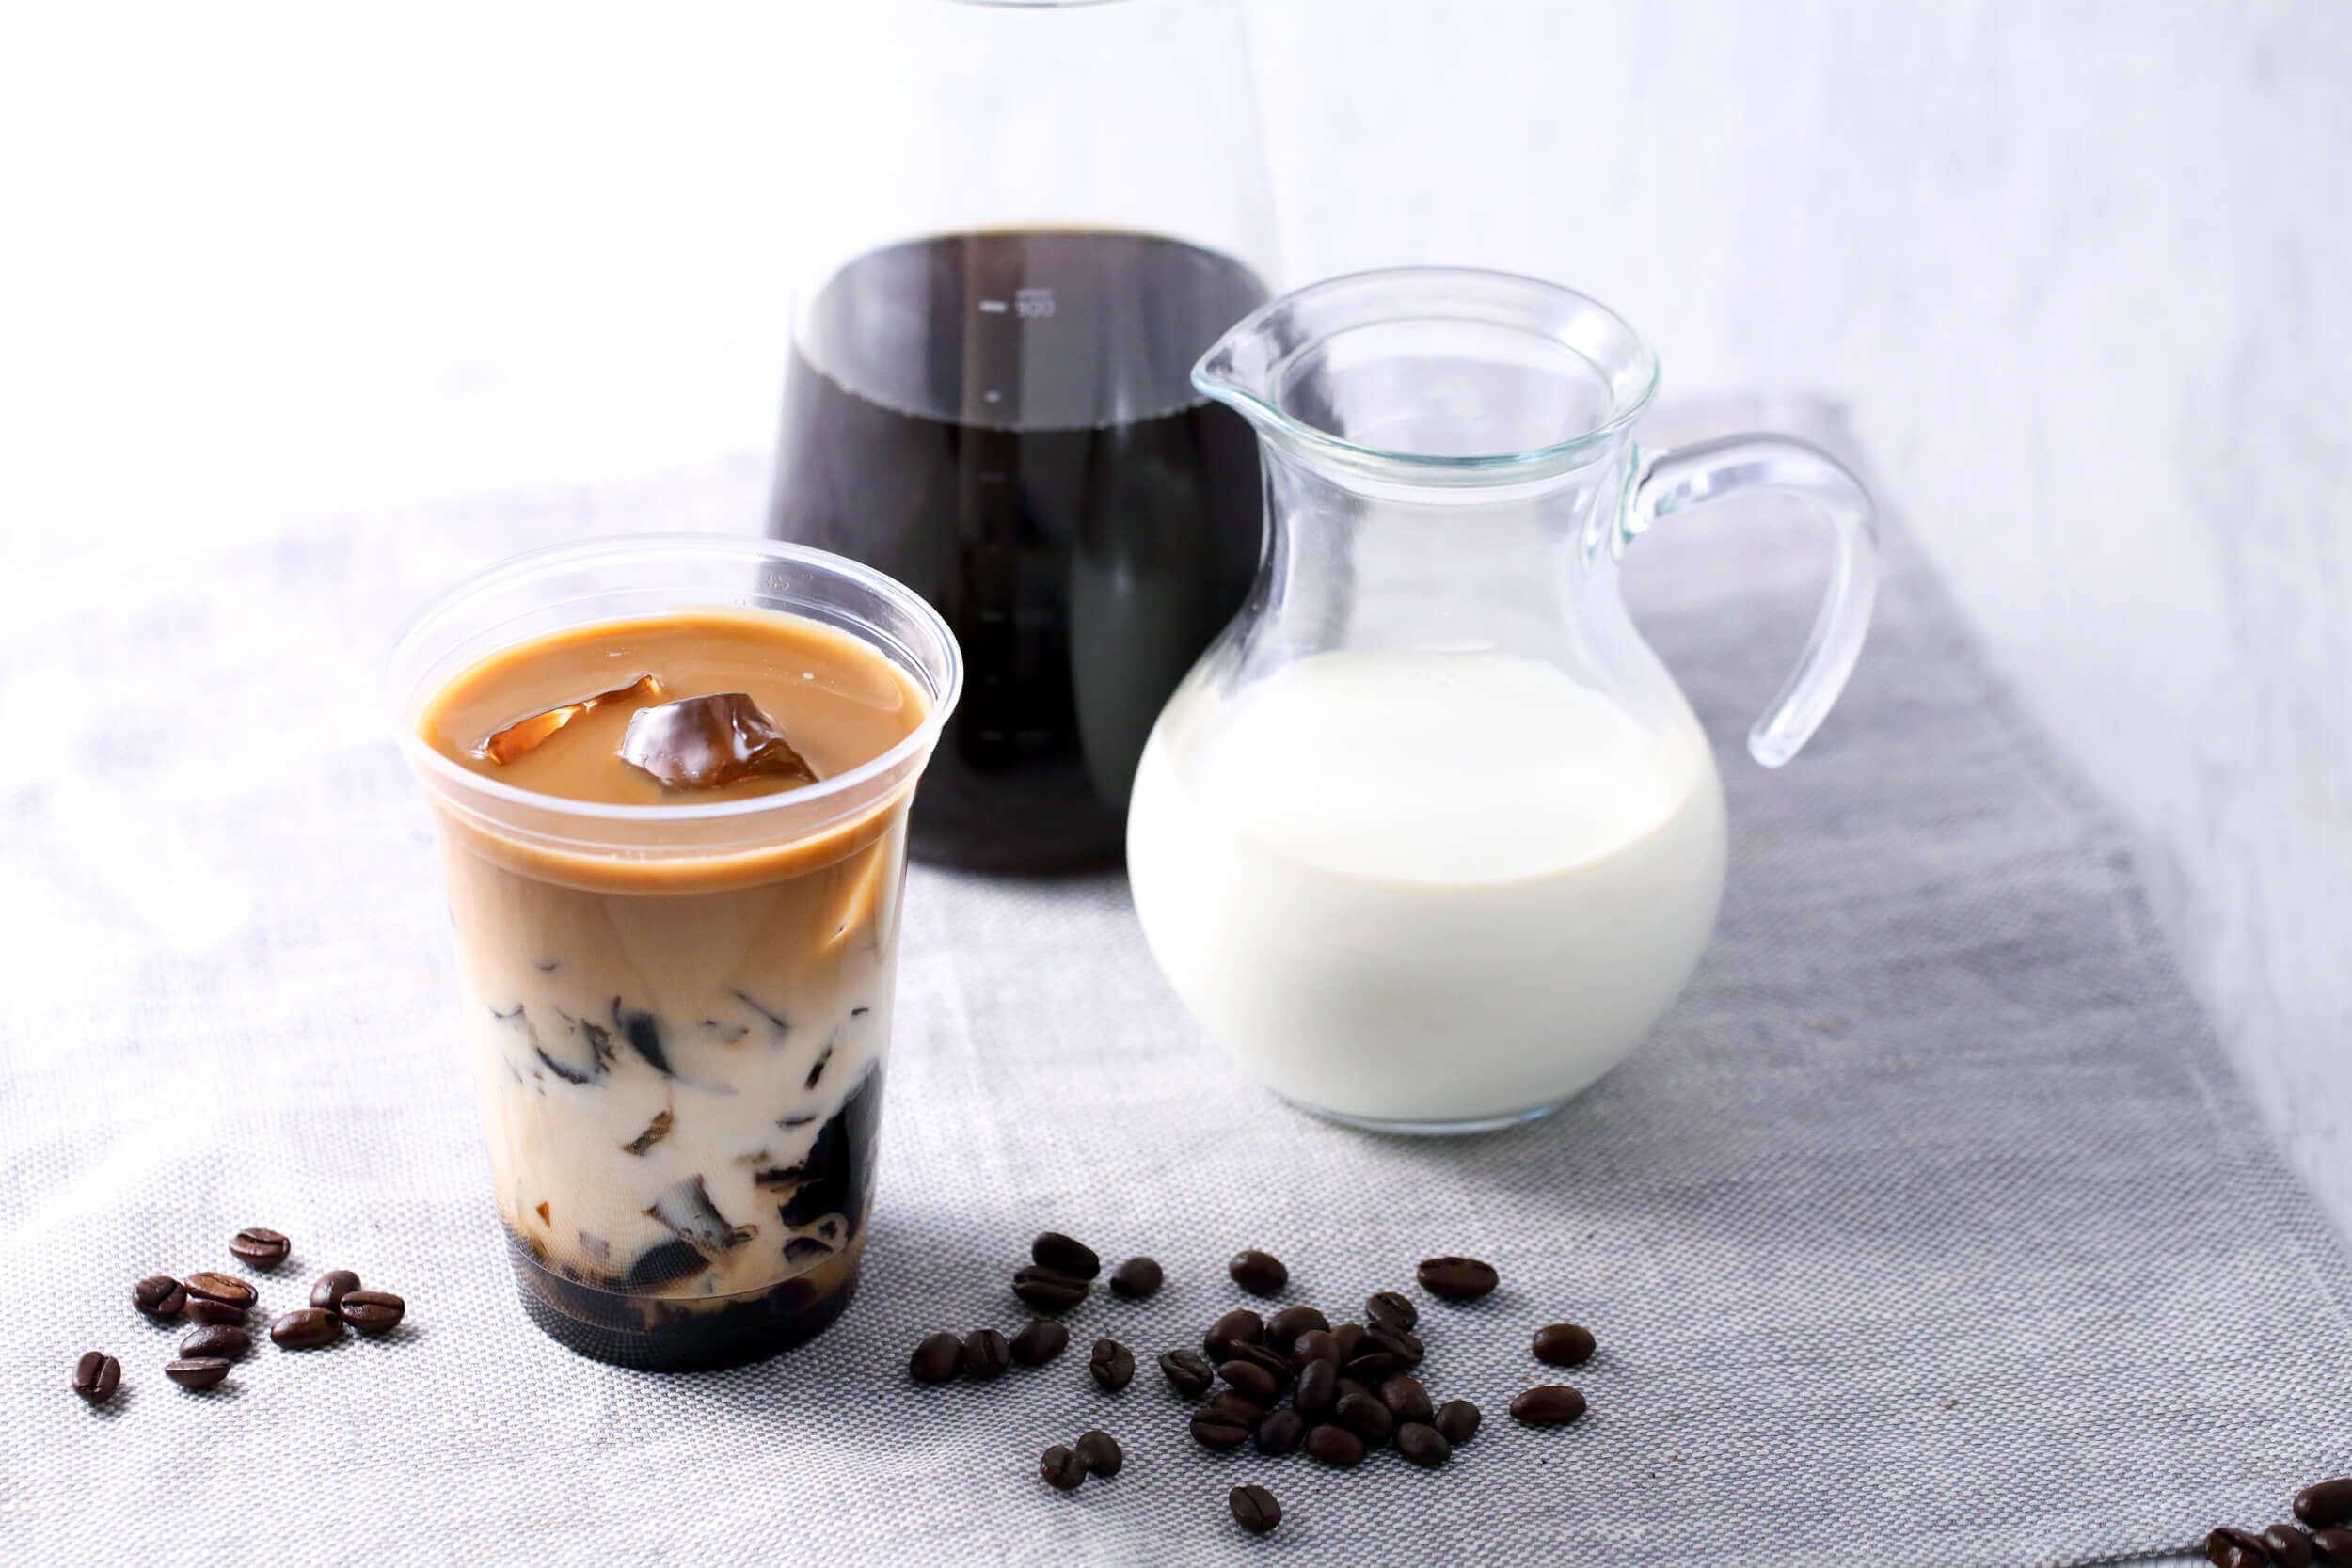 Scrop COFFEE ROASTERS(スクロップ コーヒー ロースターズ )のコーヒーゼリーカフェオレ/¥550(税込み)